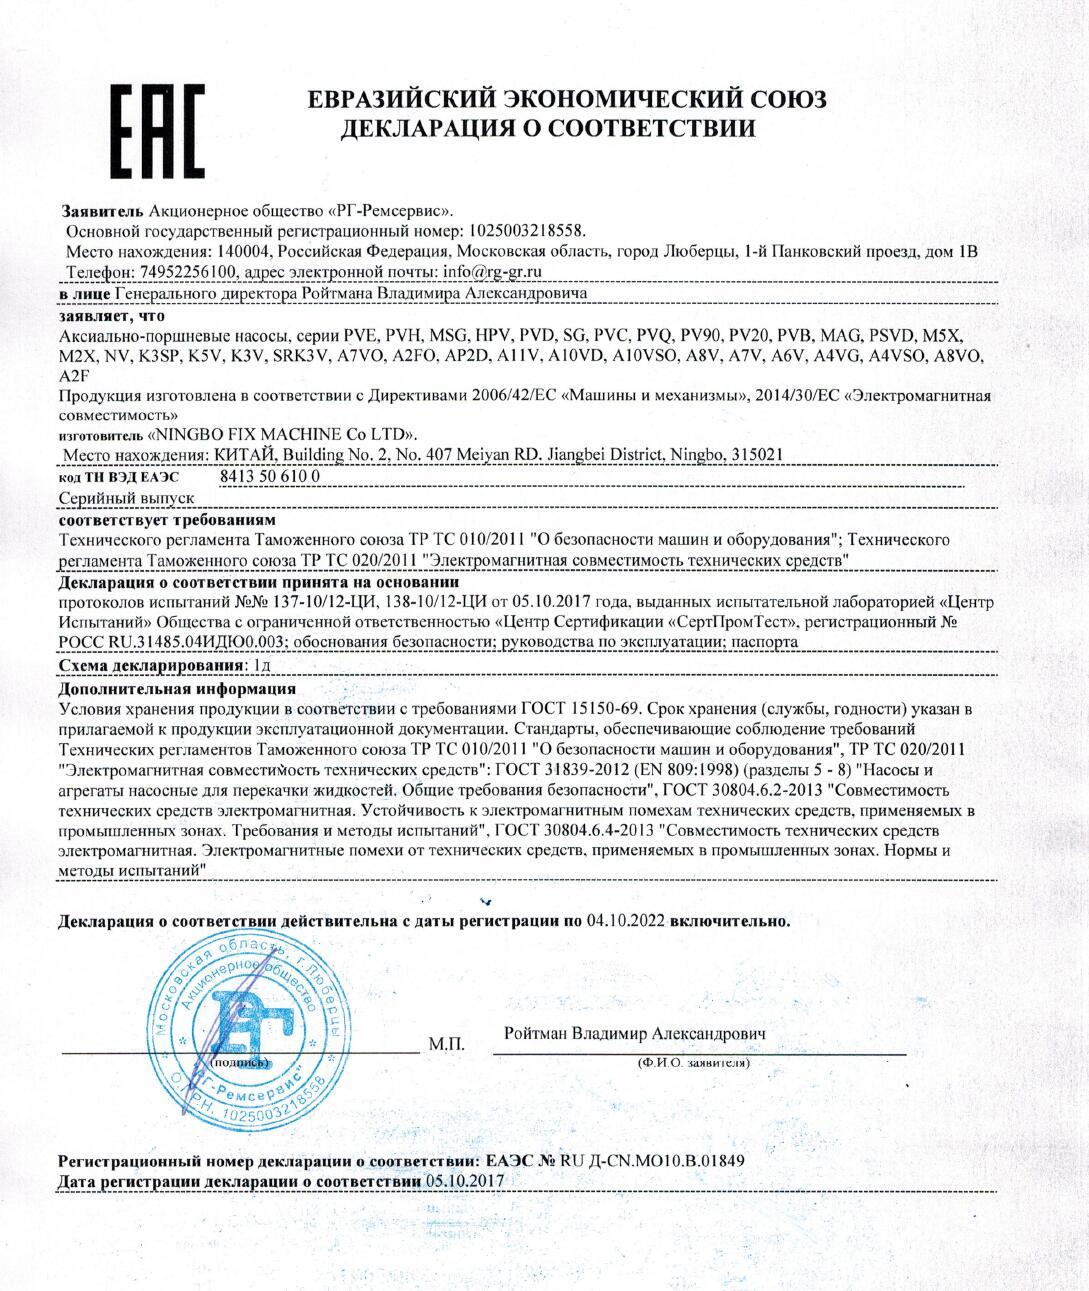 CU-TR/EAC认证符合声明/CU-TR declaration